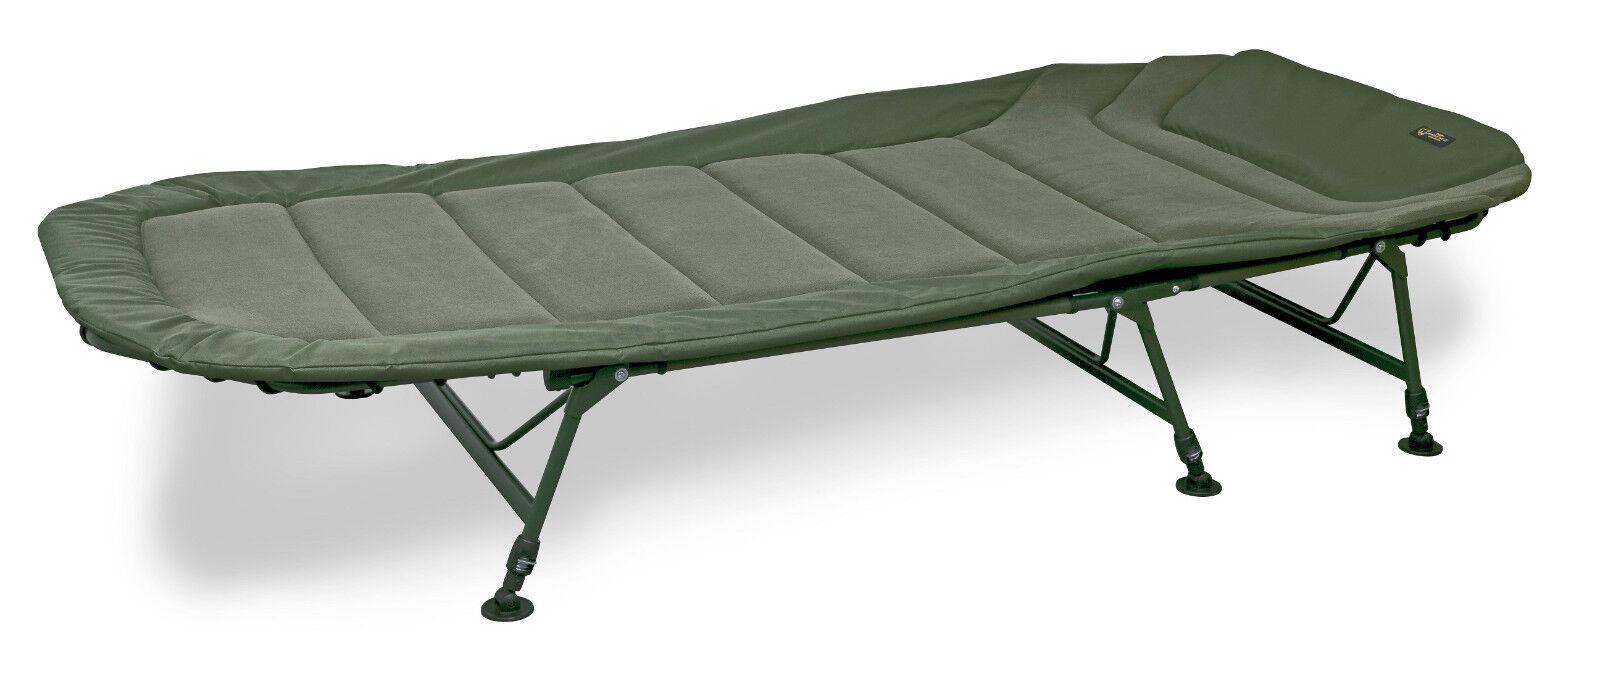 Fox Warrior II 6 Crosslegged Bedchair cbc070 LETTINO Bed Chair ANGEL LETTINO Carpa Lettino